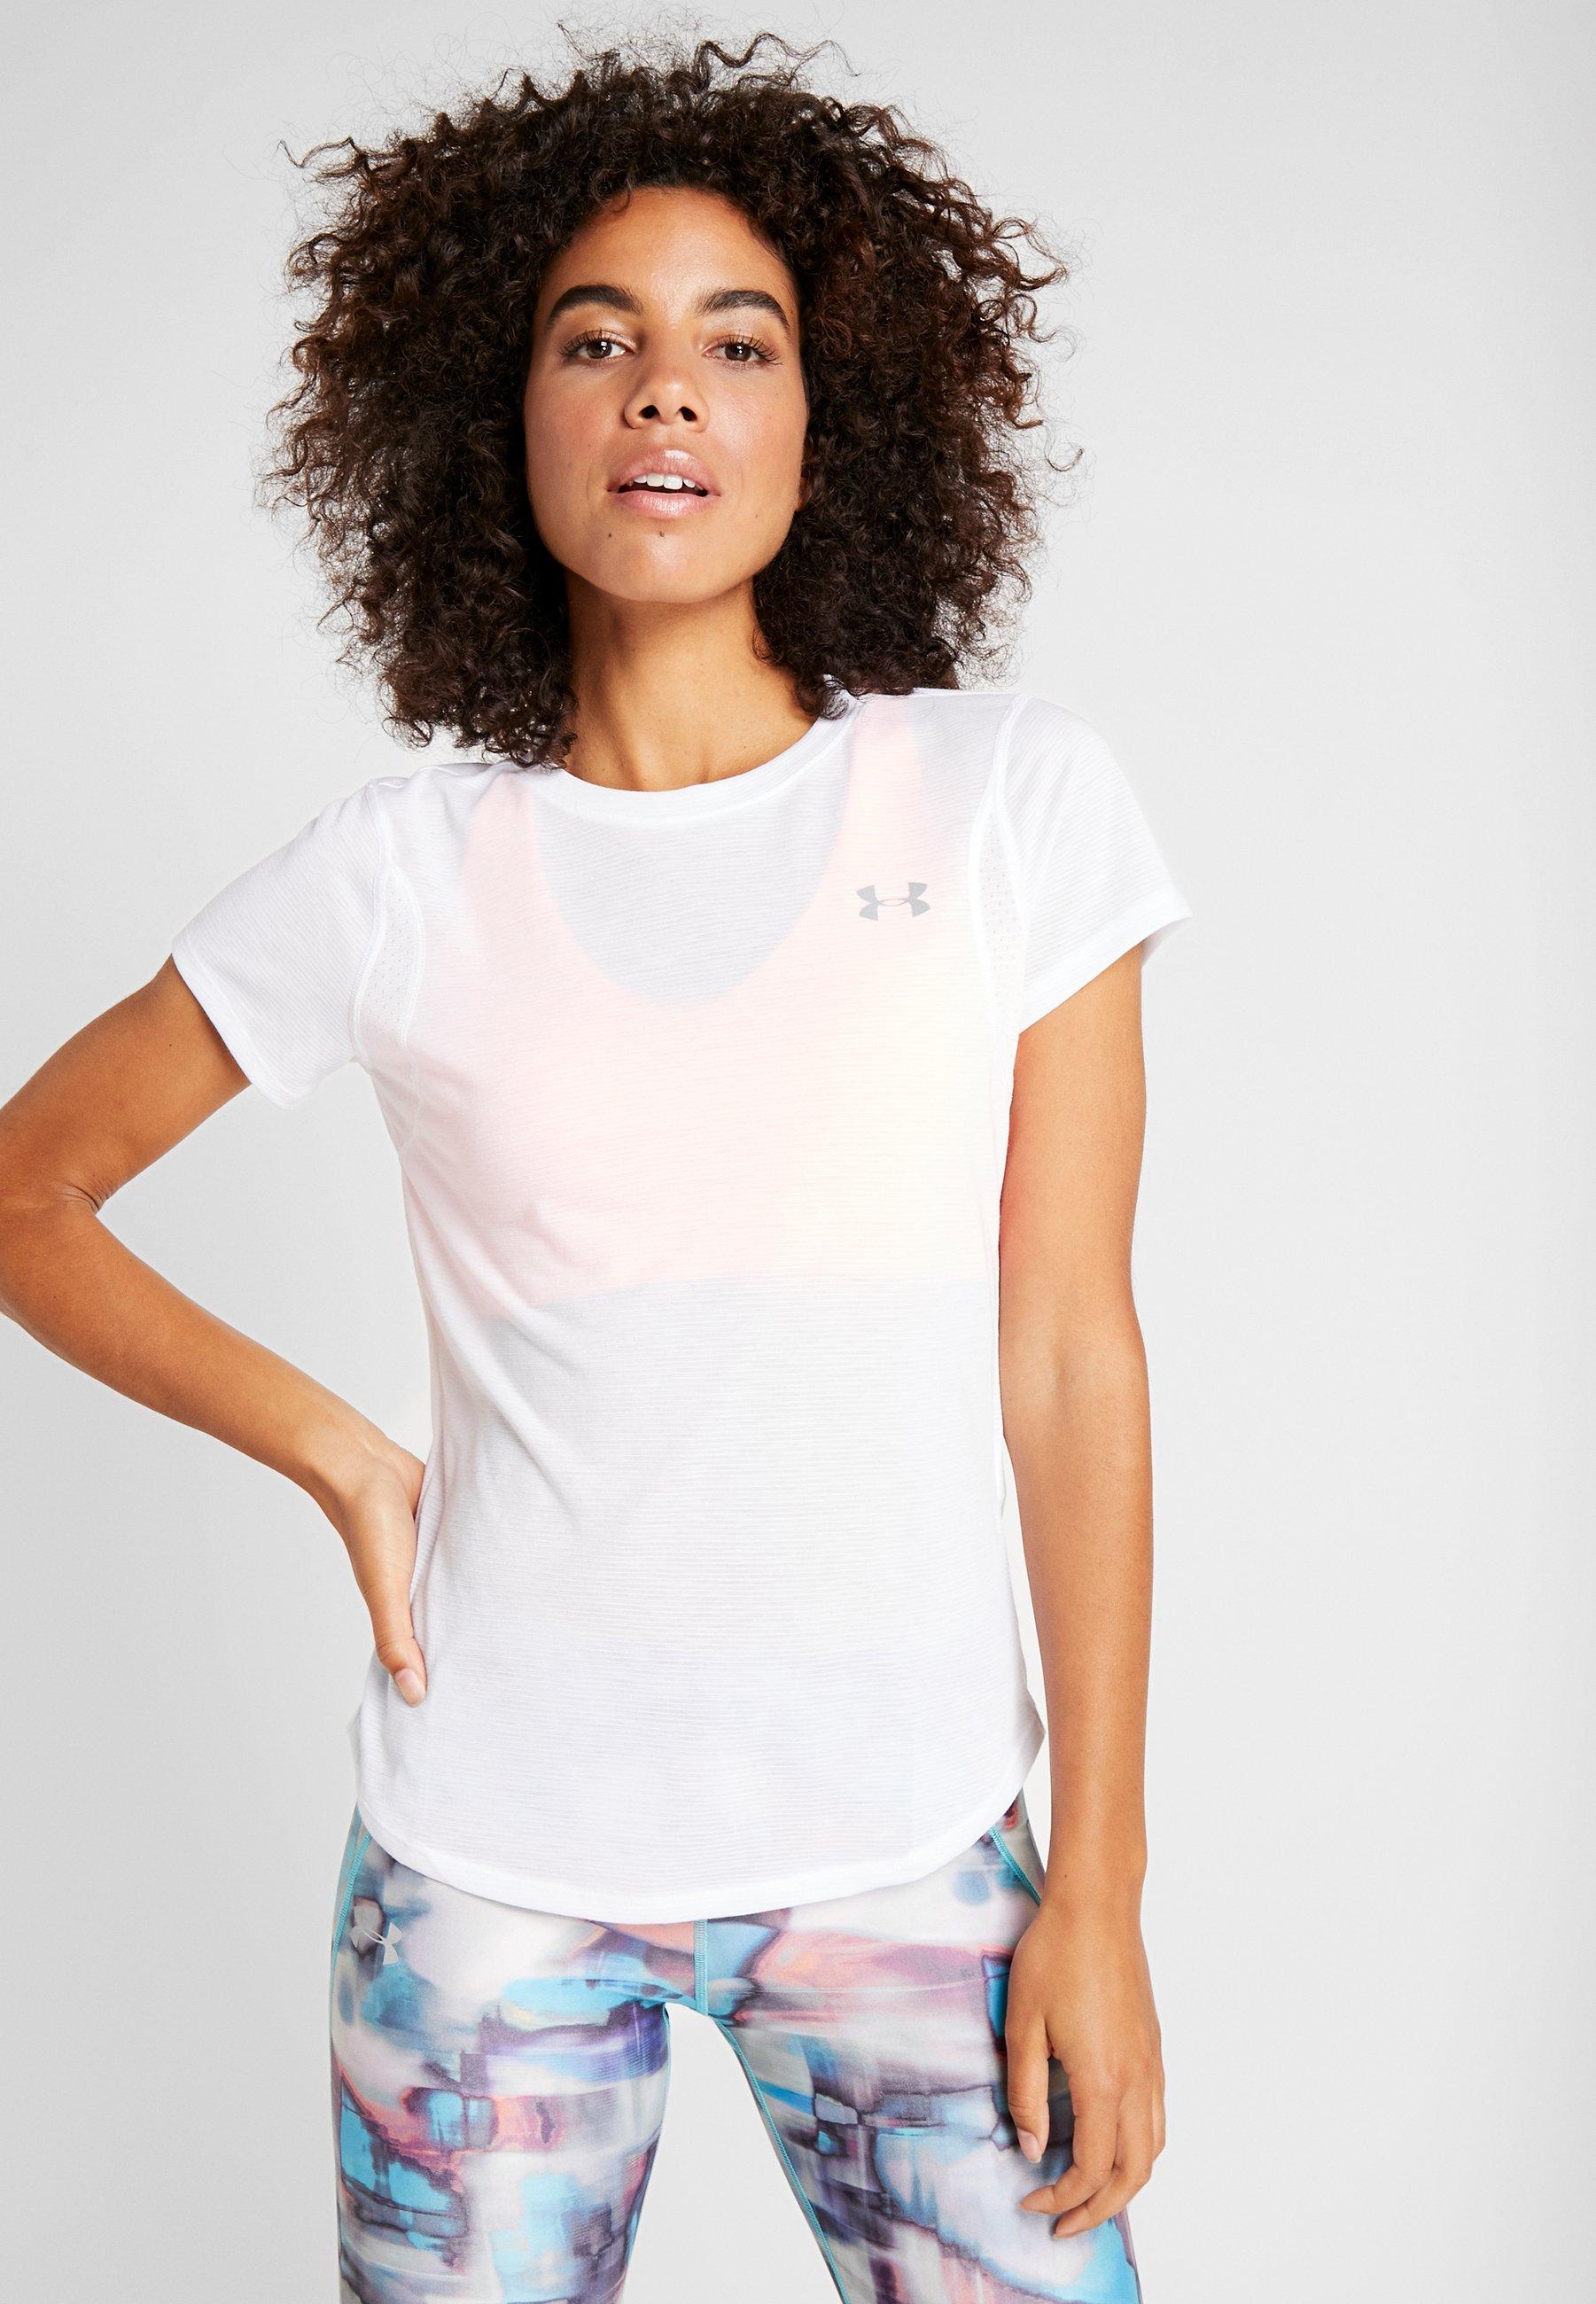 Armour Under White shirt SleeveT Imprimé reflective Short Streaker 8wkOPn0